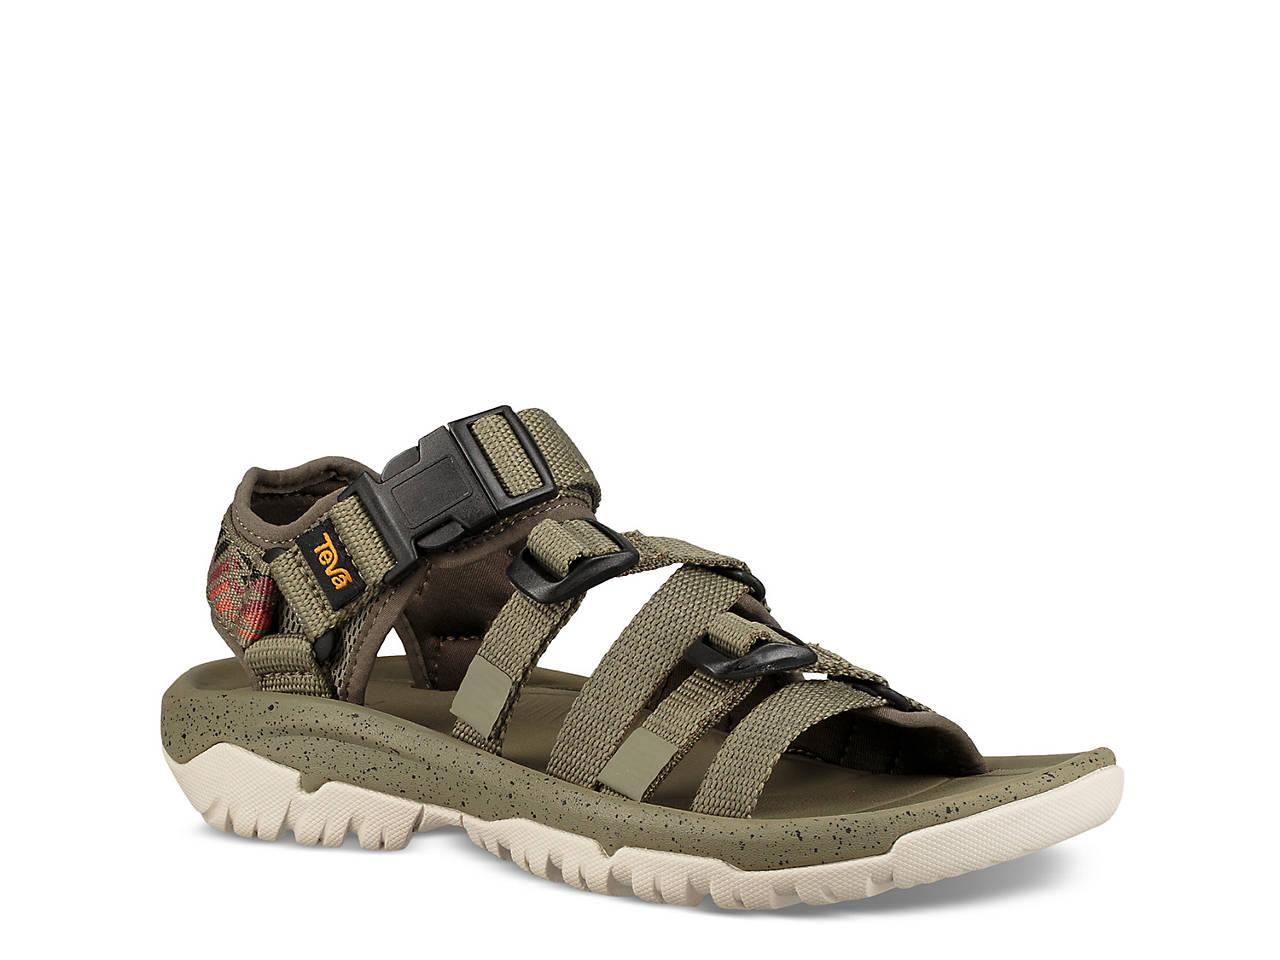 b10a967f0 Teva Hurricane XLT2 ALP Sandal Women s Shoes